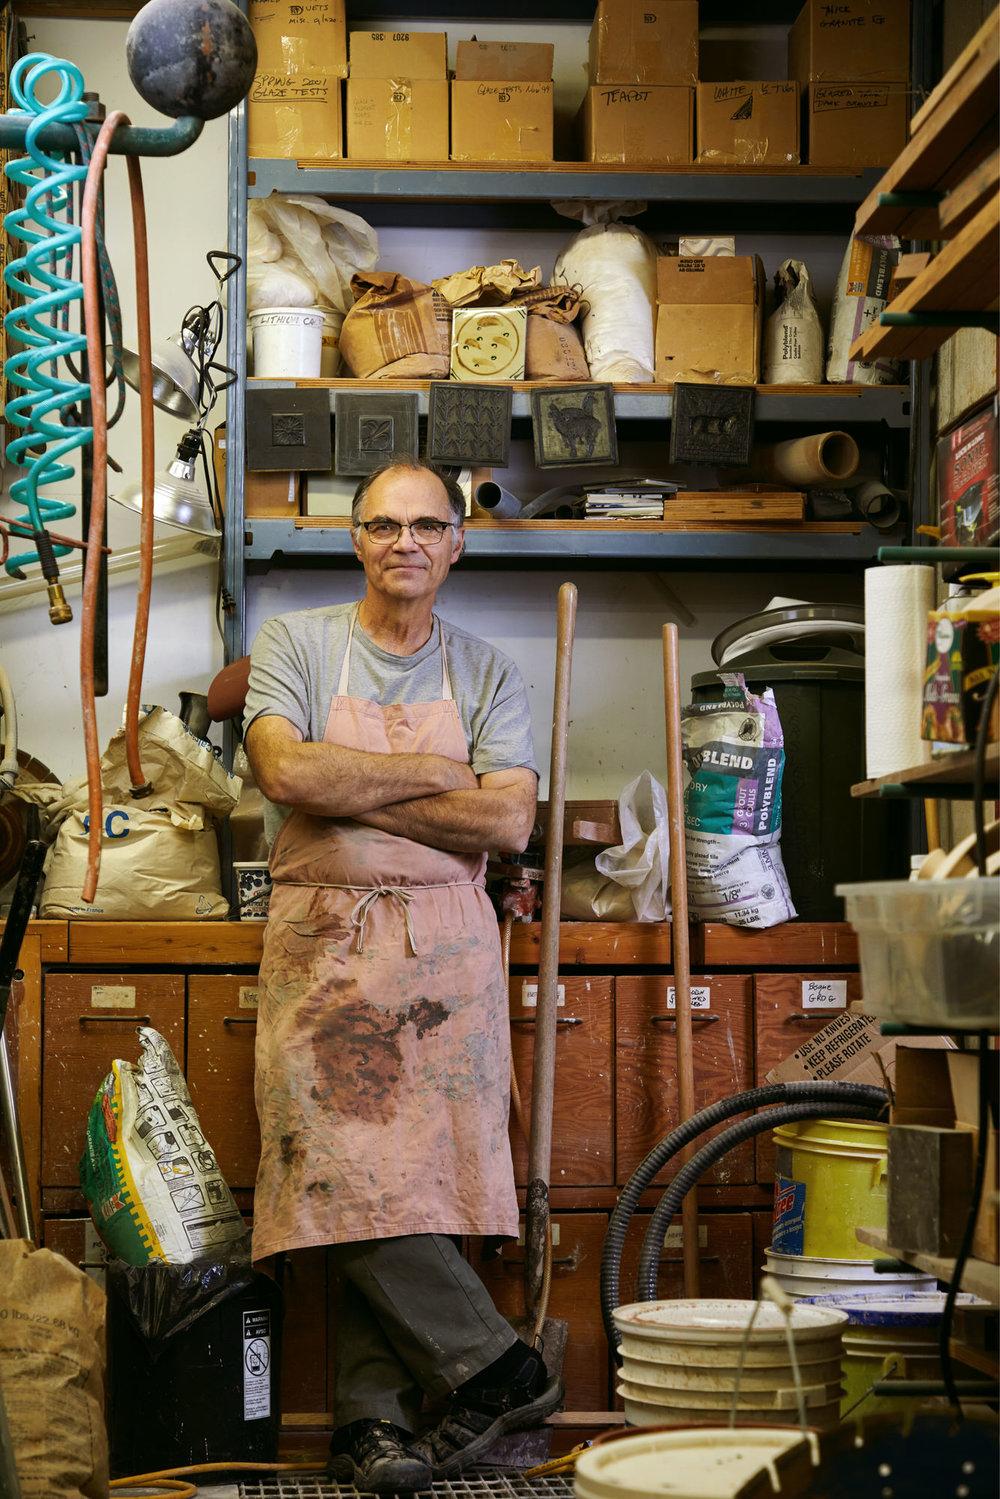 Sam Uhlick edmonton-commercial-photographer-portrait-photography-advertisting-ad-corporate-portraiture-yeg-ryan-parker-photo-parkerphotojpg.jpg